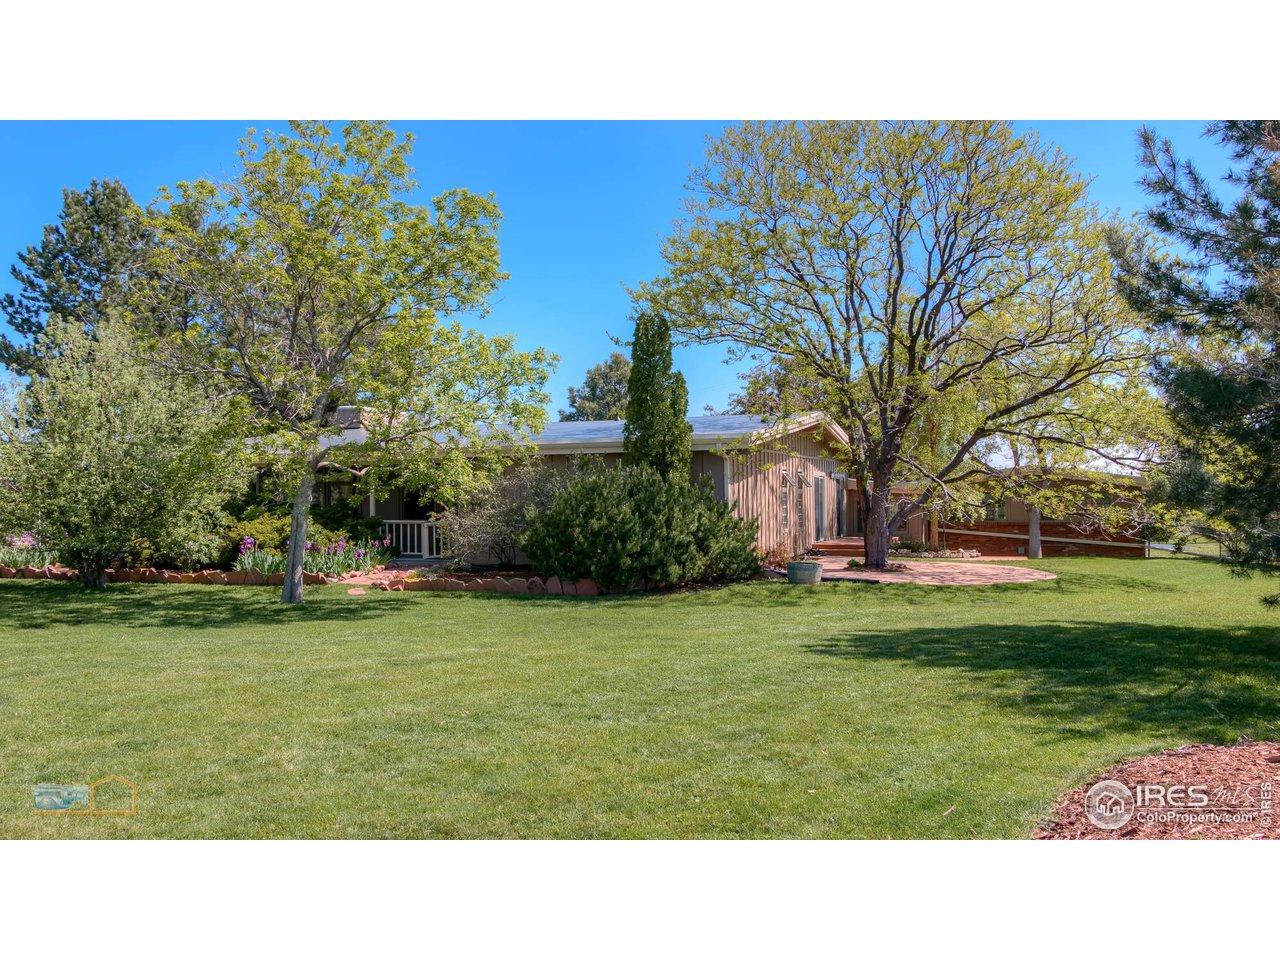 7444 Panorama Dr, Boulder CO 80303